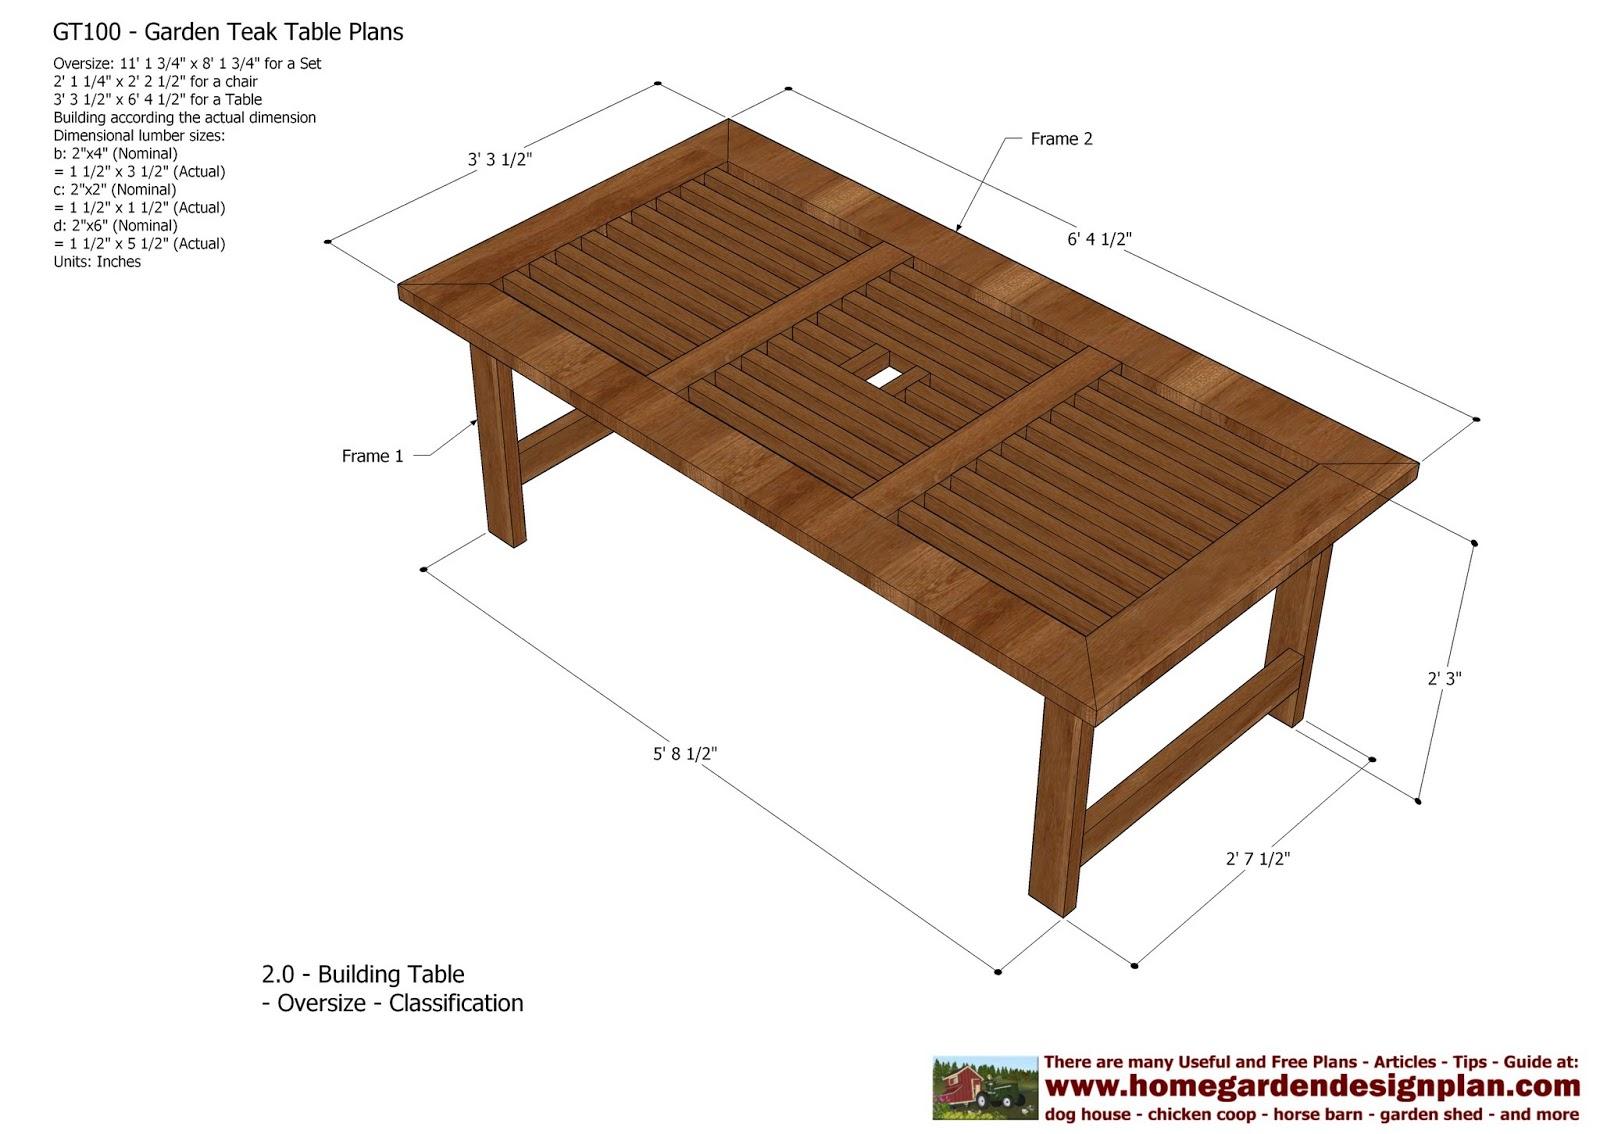 home garden plans: GT100 - Garden Teak Tables ...